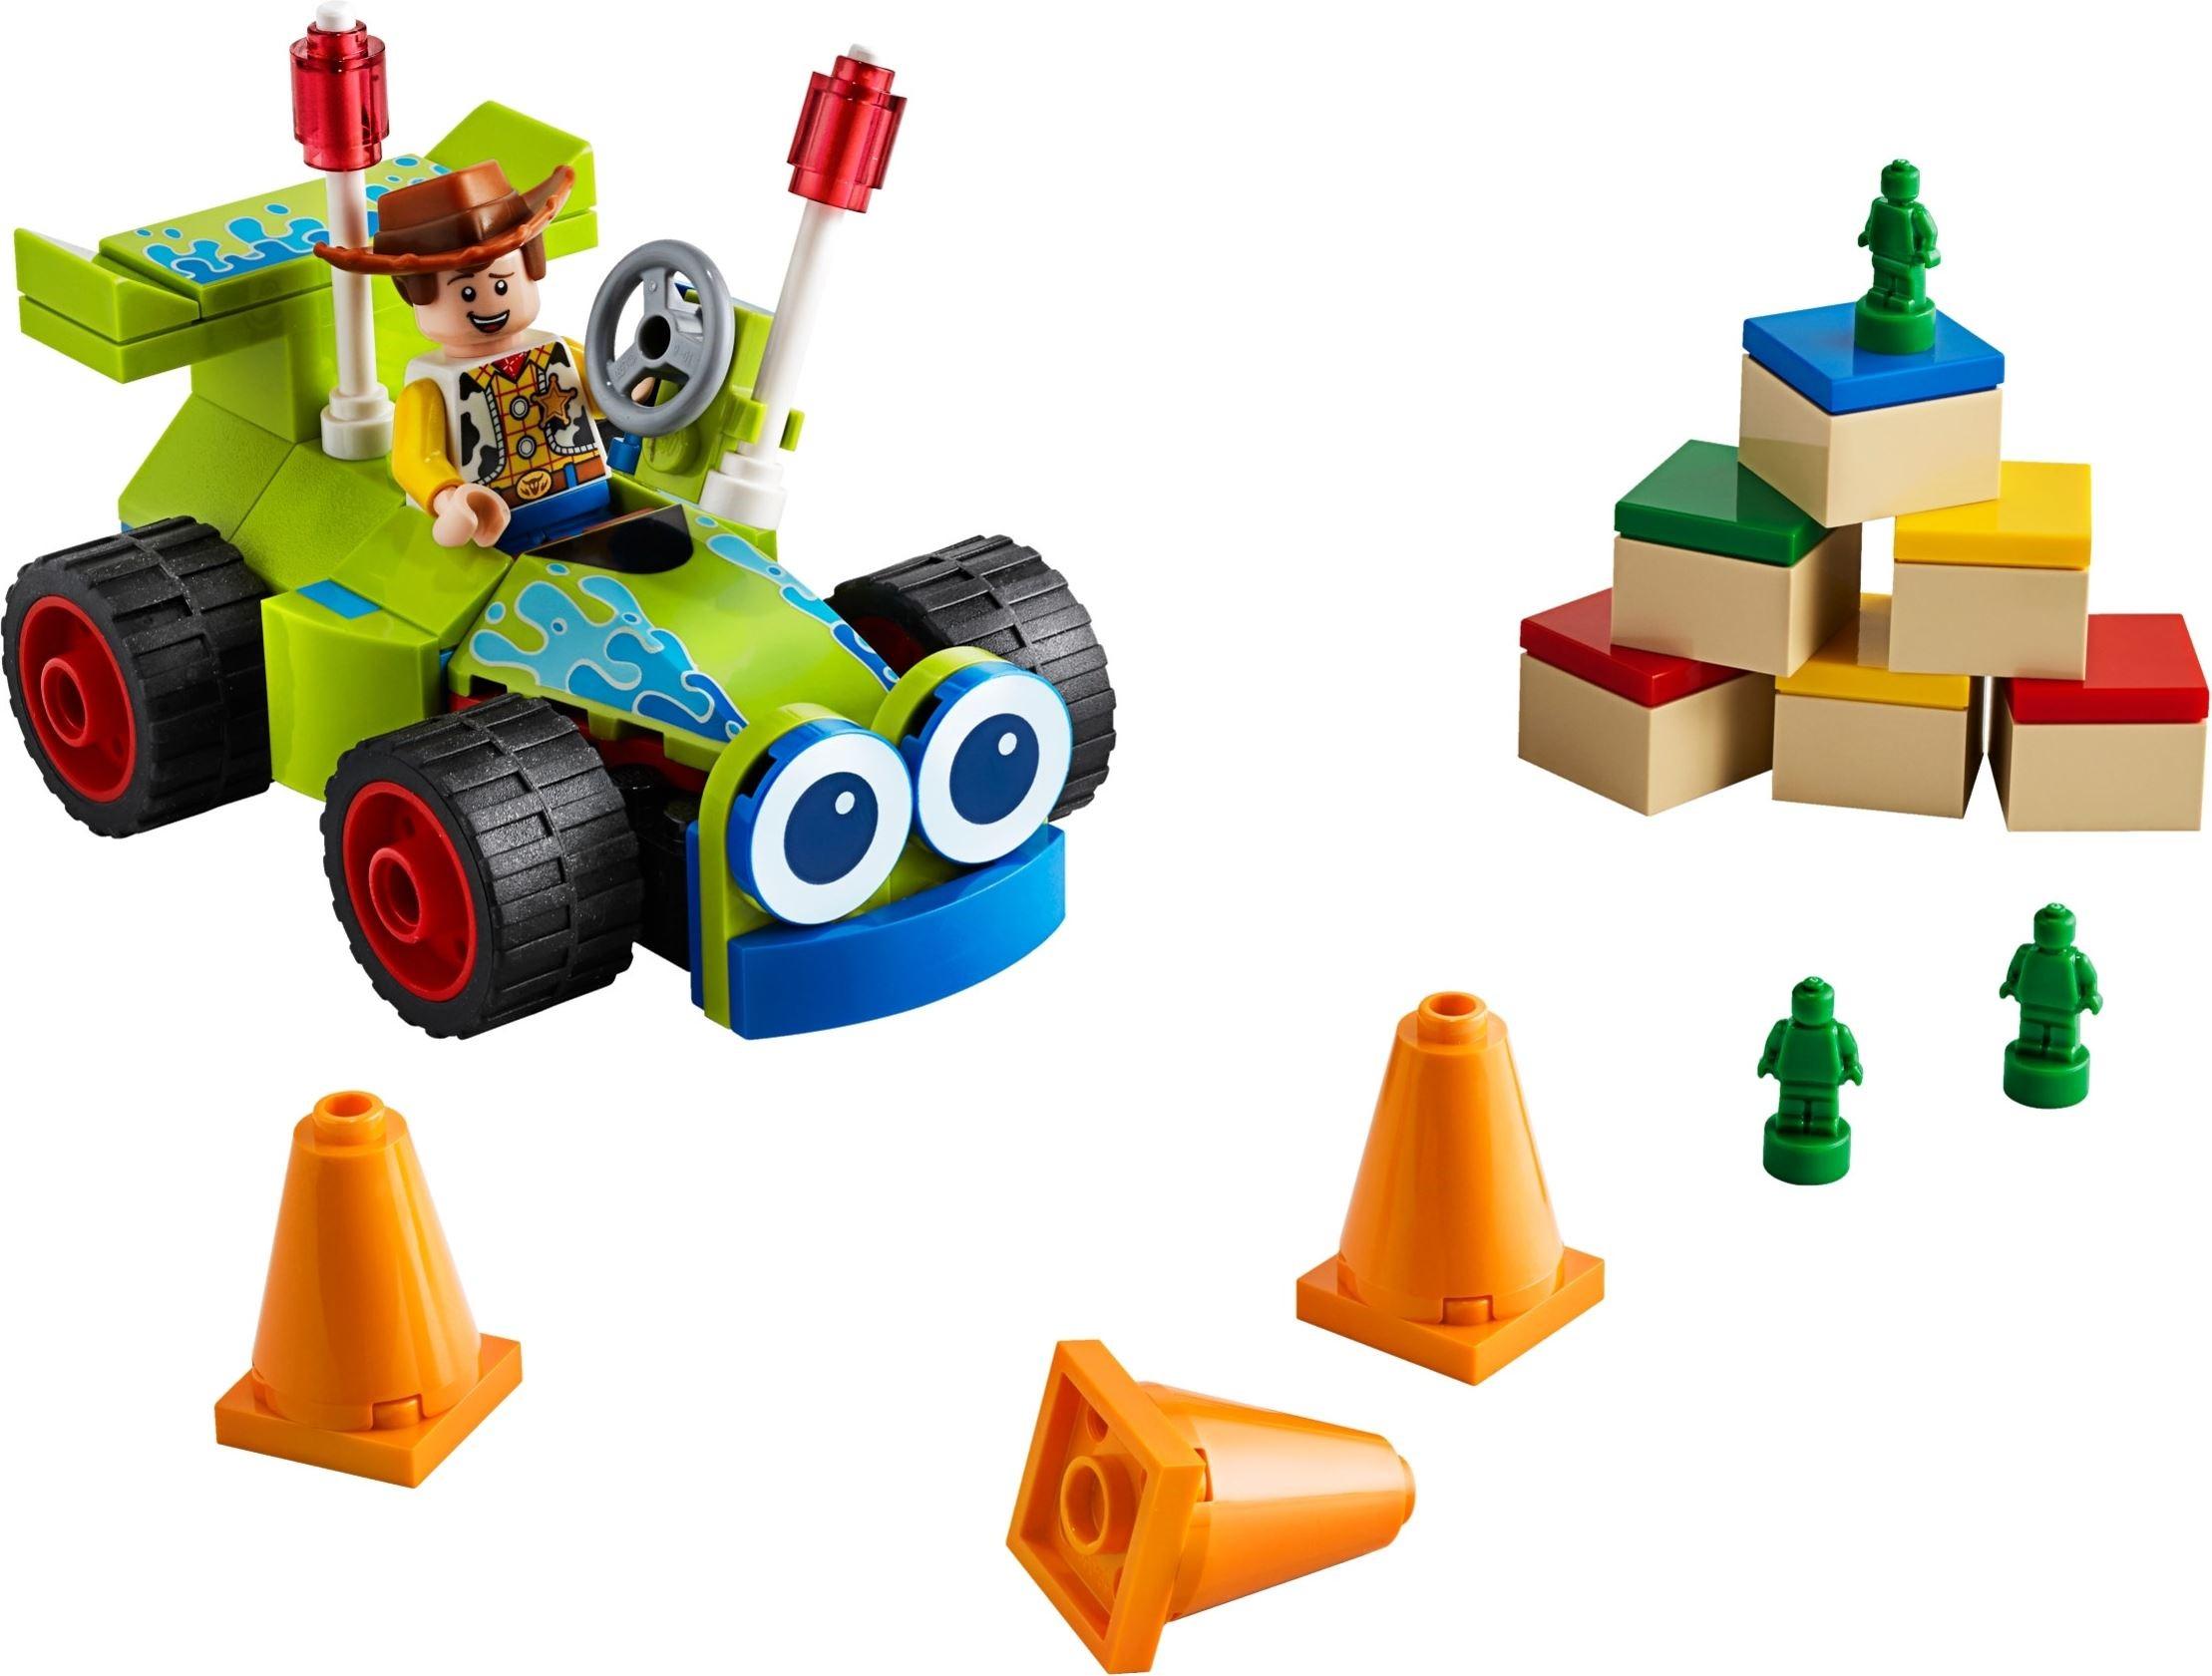 Split From Toy Story Set 10766 LEGO Woody Minifigure